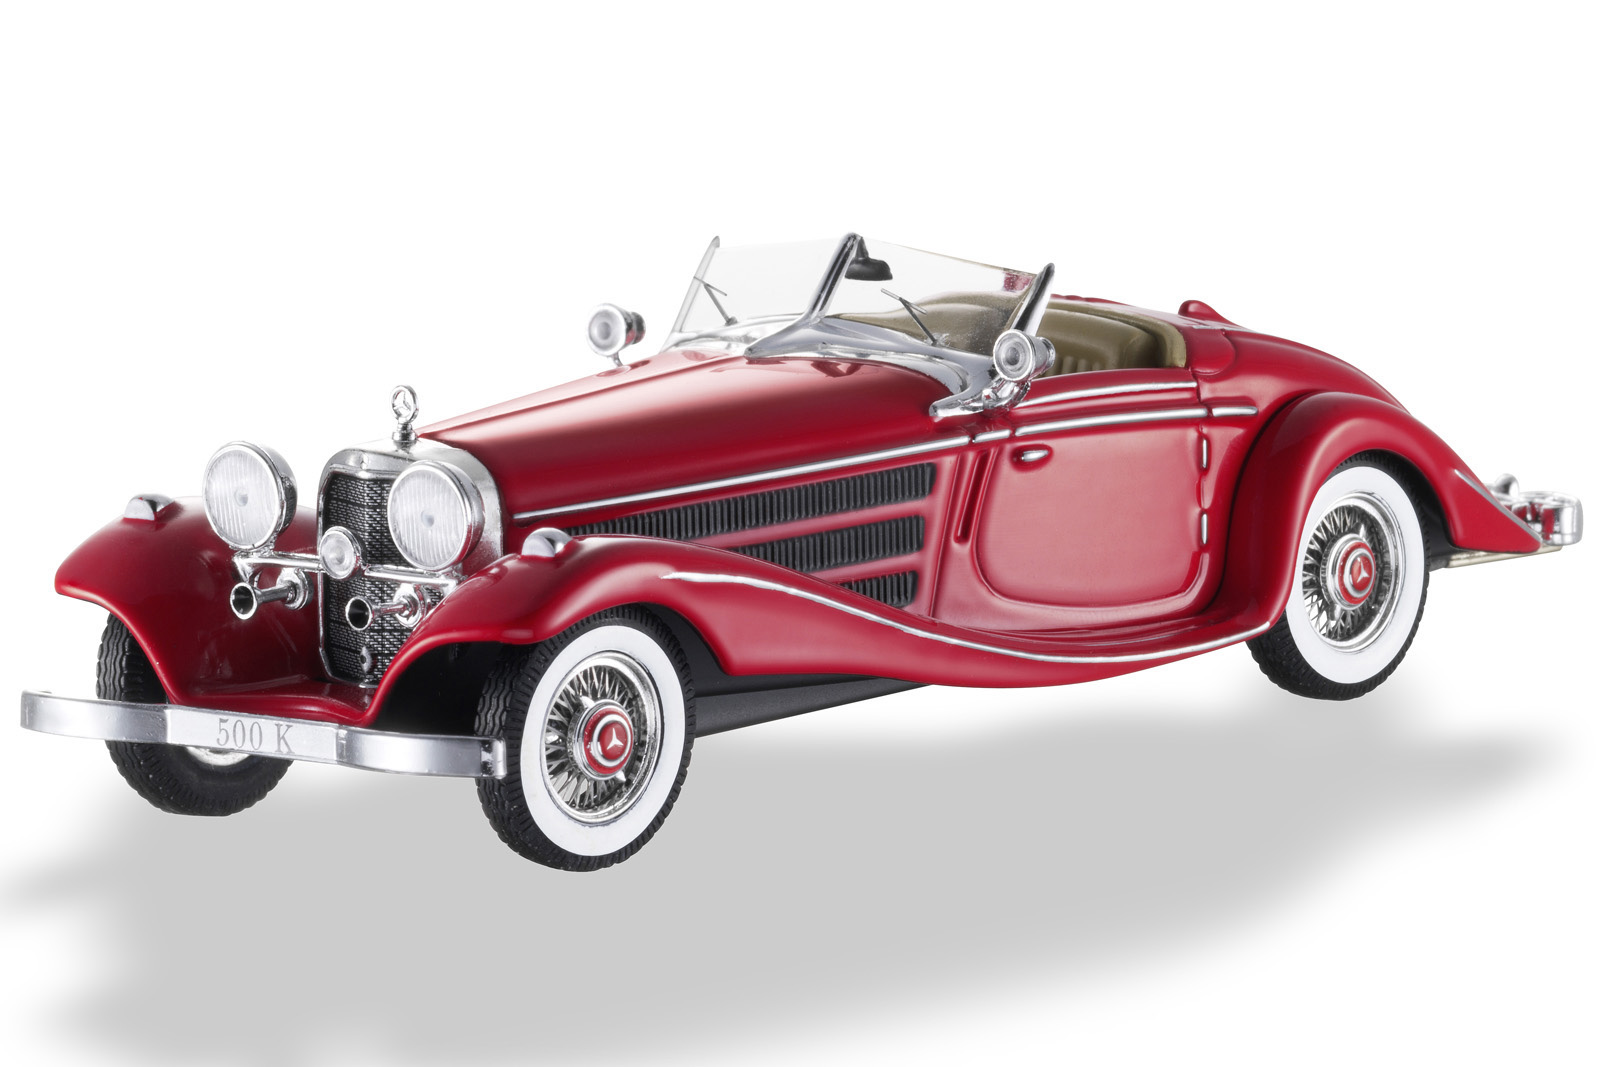 1936 Mercedes-Benz 500 K Special Roadster, Model Car